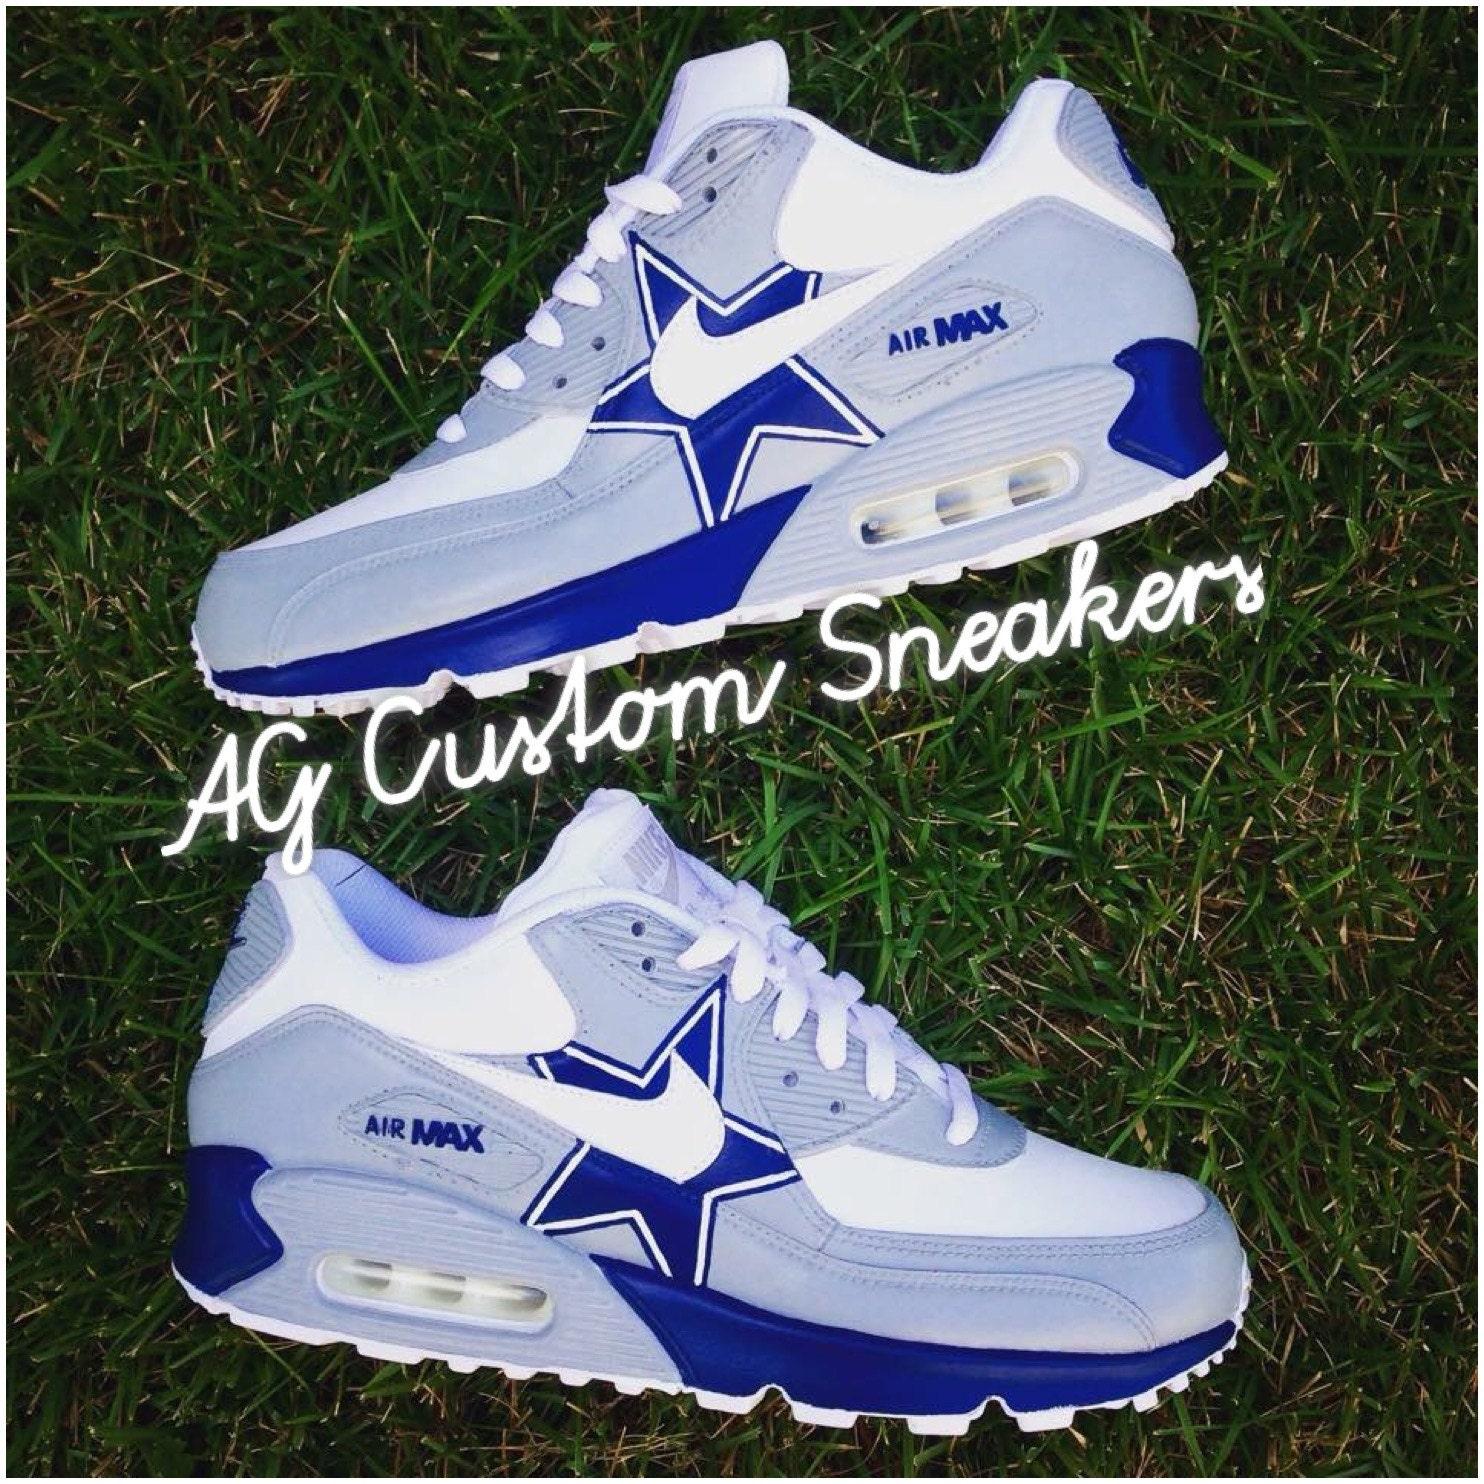 pretty nice 4ef6c 671e9 good adidas adizero f50 trx df541 40116  switzerland air max 90 dallas  cowboy 6f0eb 0e63c